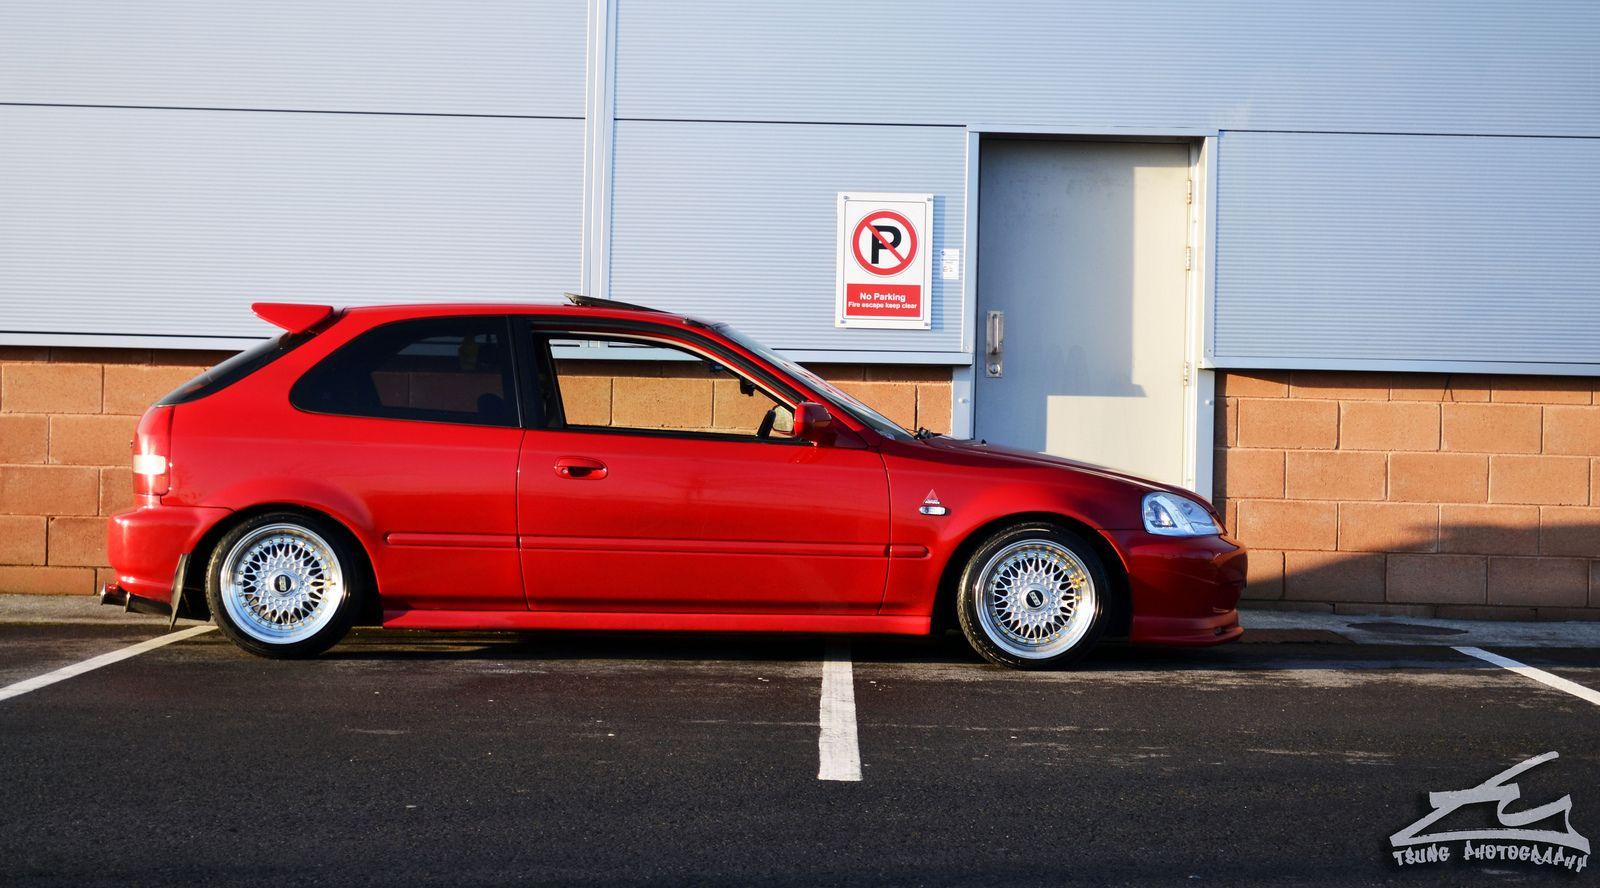 Honda civic 6 hatchback